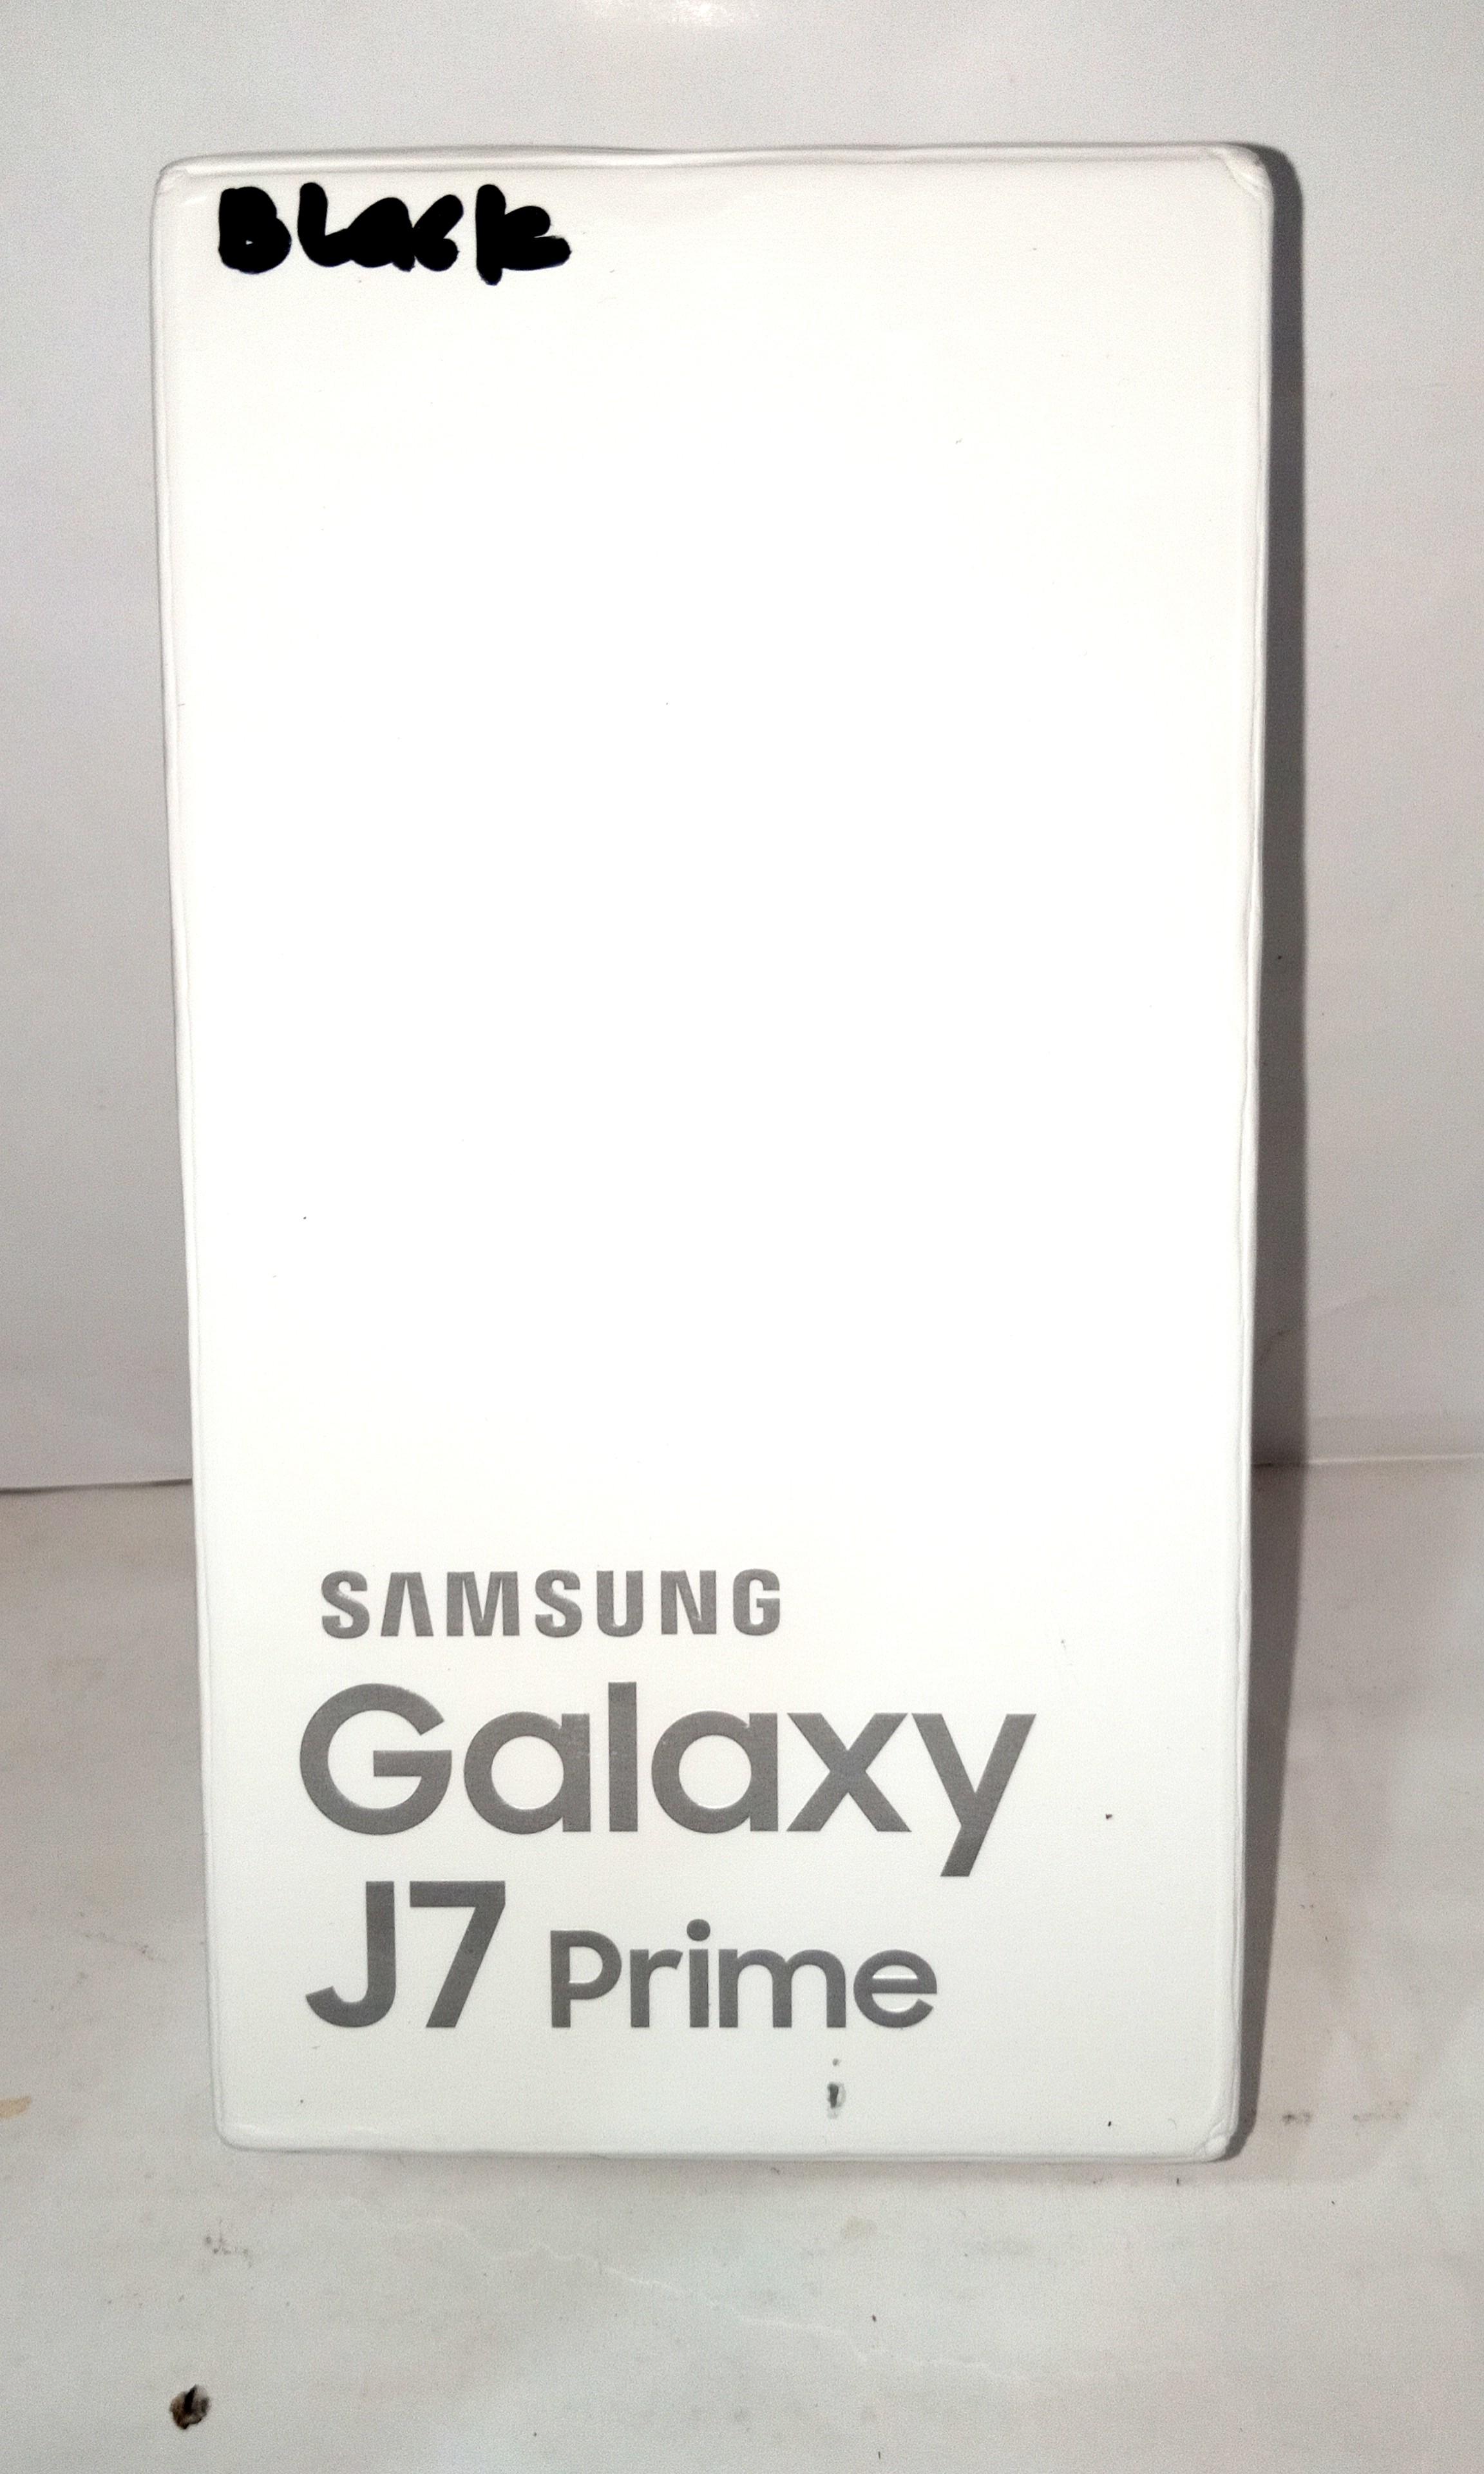 SAMSUNG J7 PRIME RAM 3GB HARGA PROMO GARANSI RESMI 1 TAHUN Telepon Seluler Tablet Ponsel Android Samsung Di Carousell